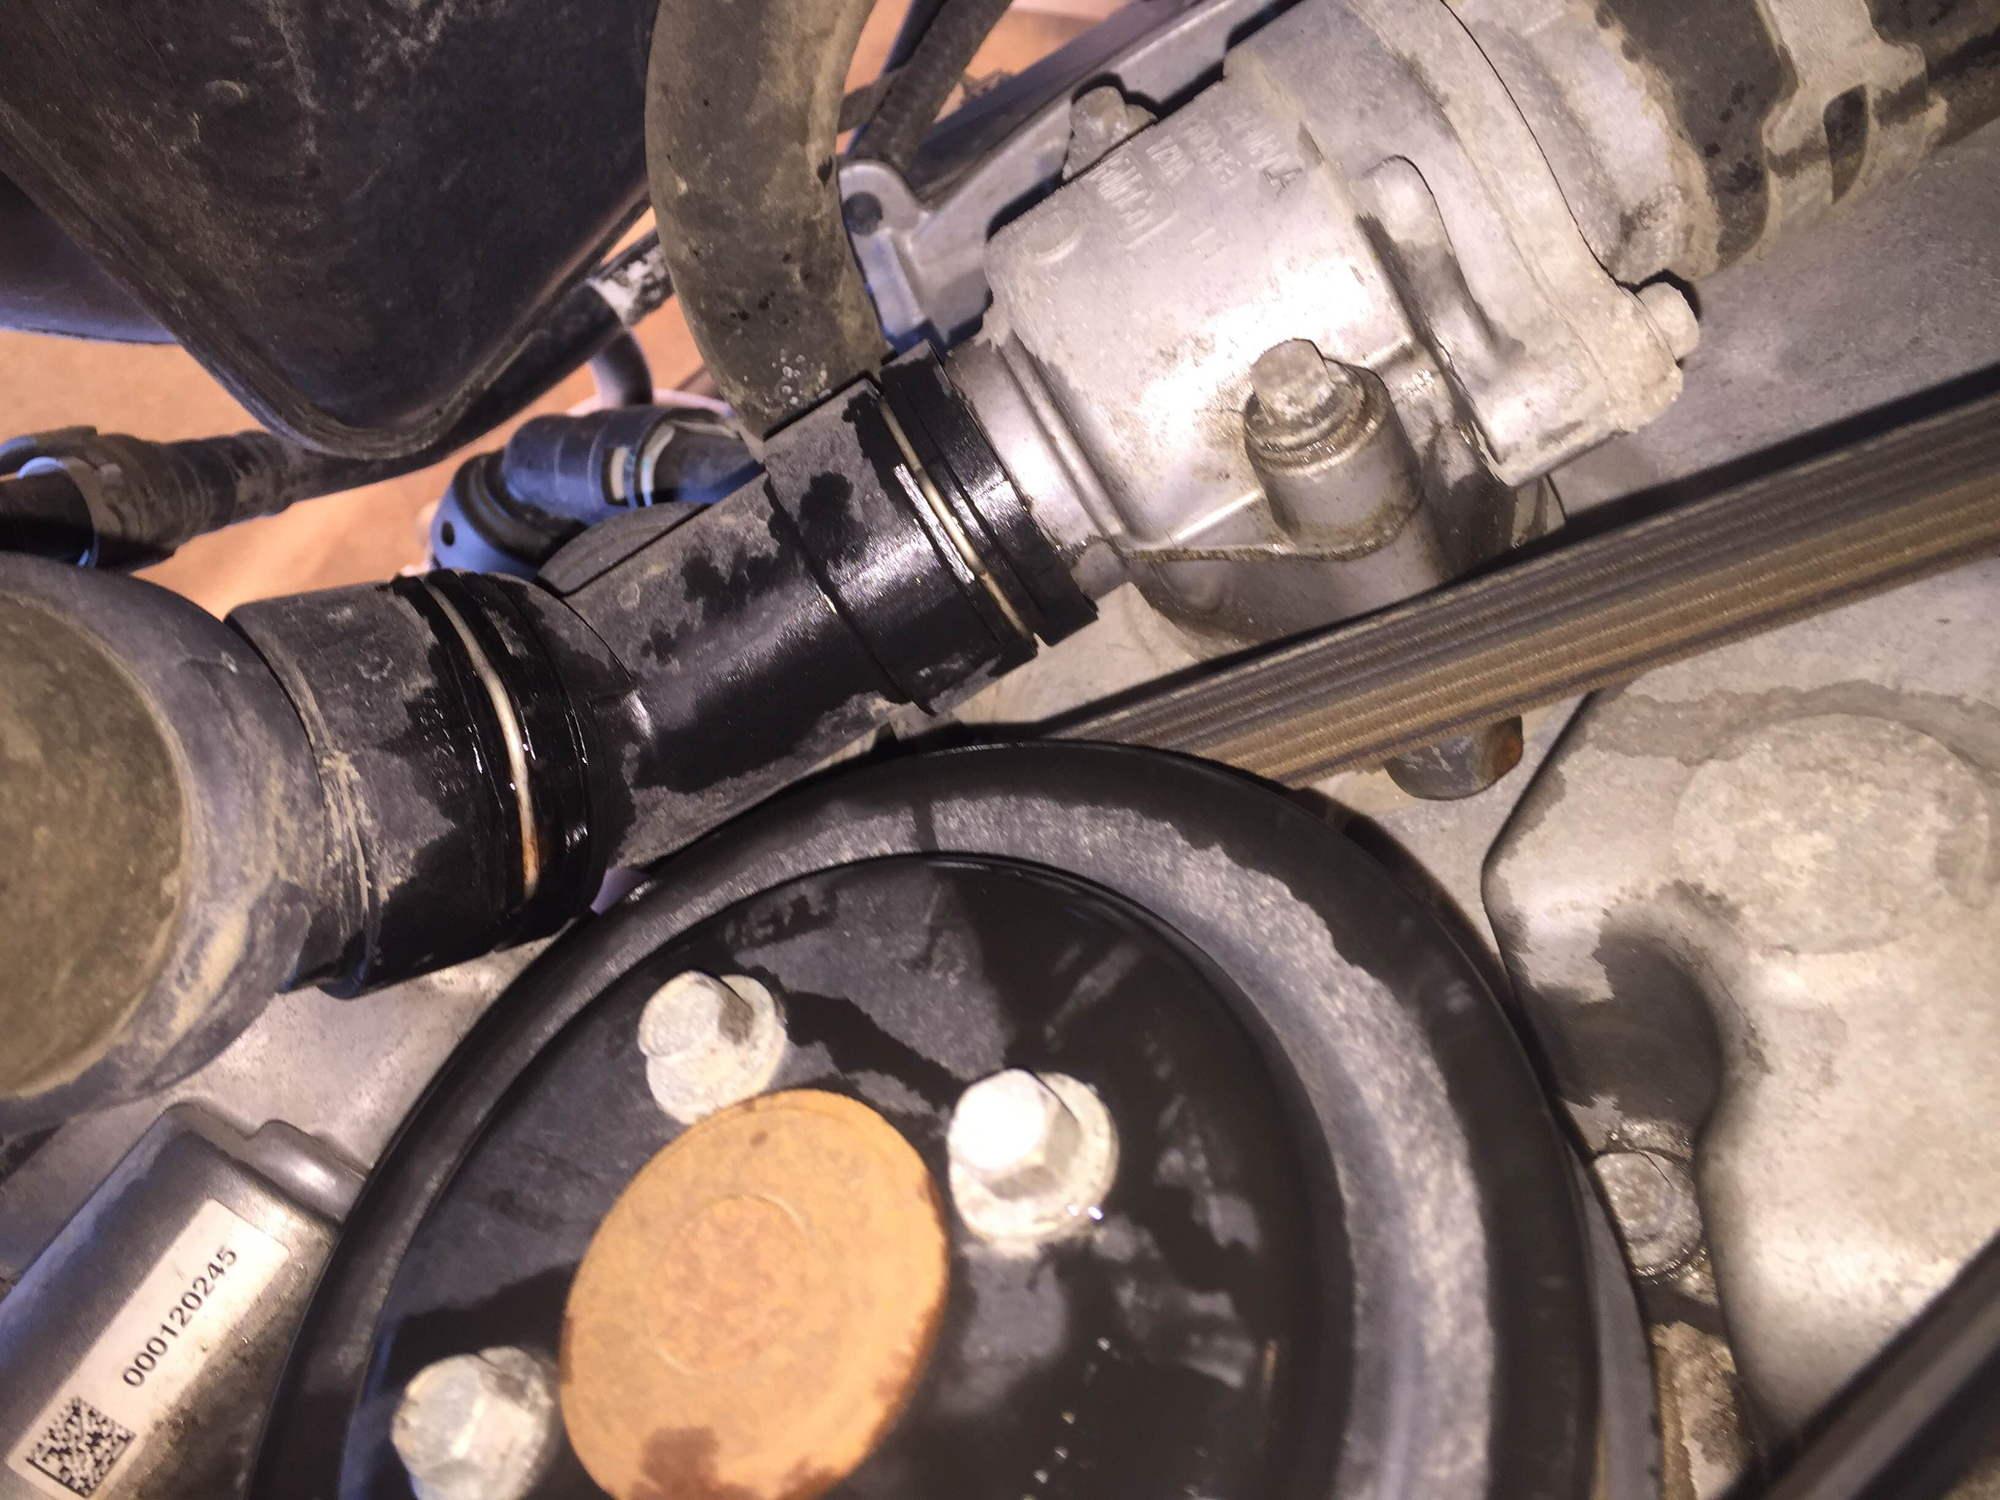 2012 Ford F 150 Coolant Leak additionally 2001 Chevy Malibu Cooling System Diagram besides 2004 Chevy Silverado Radio Wiring Diagram likewise Dodge Durango Engines For Sale moreover 2006 Chevy Impala Temp Sensor Wiring Diagram. on 1999 chevy malibu leaking coolant